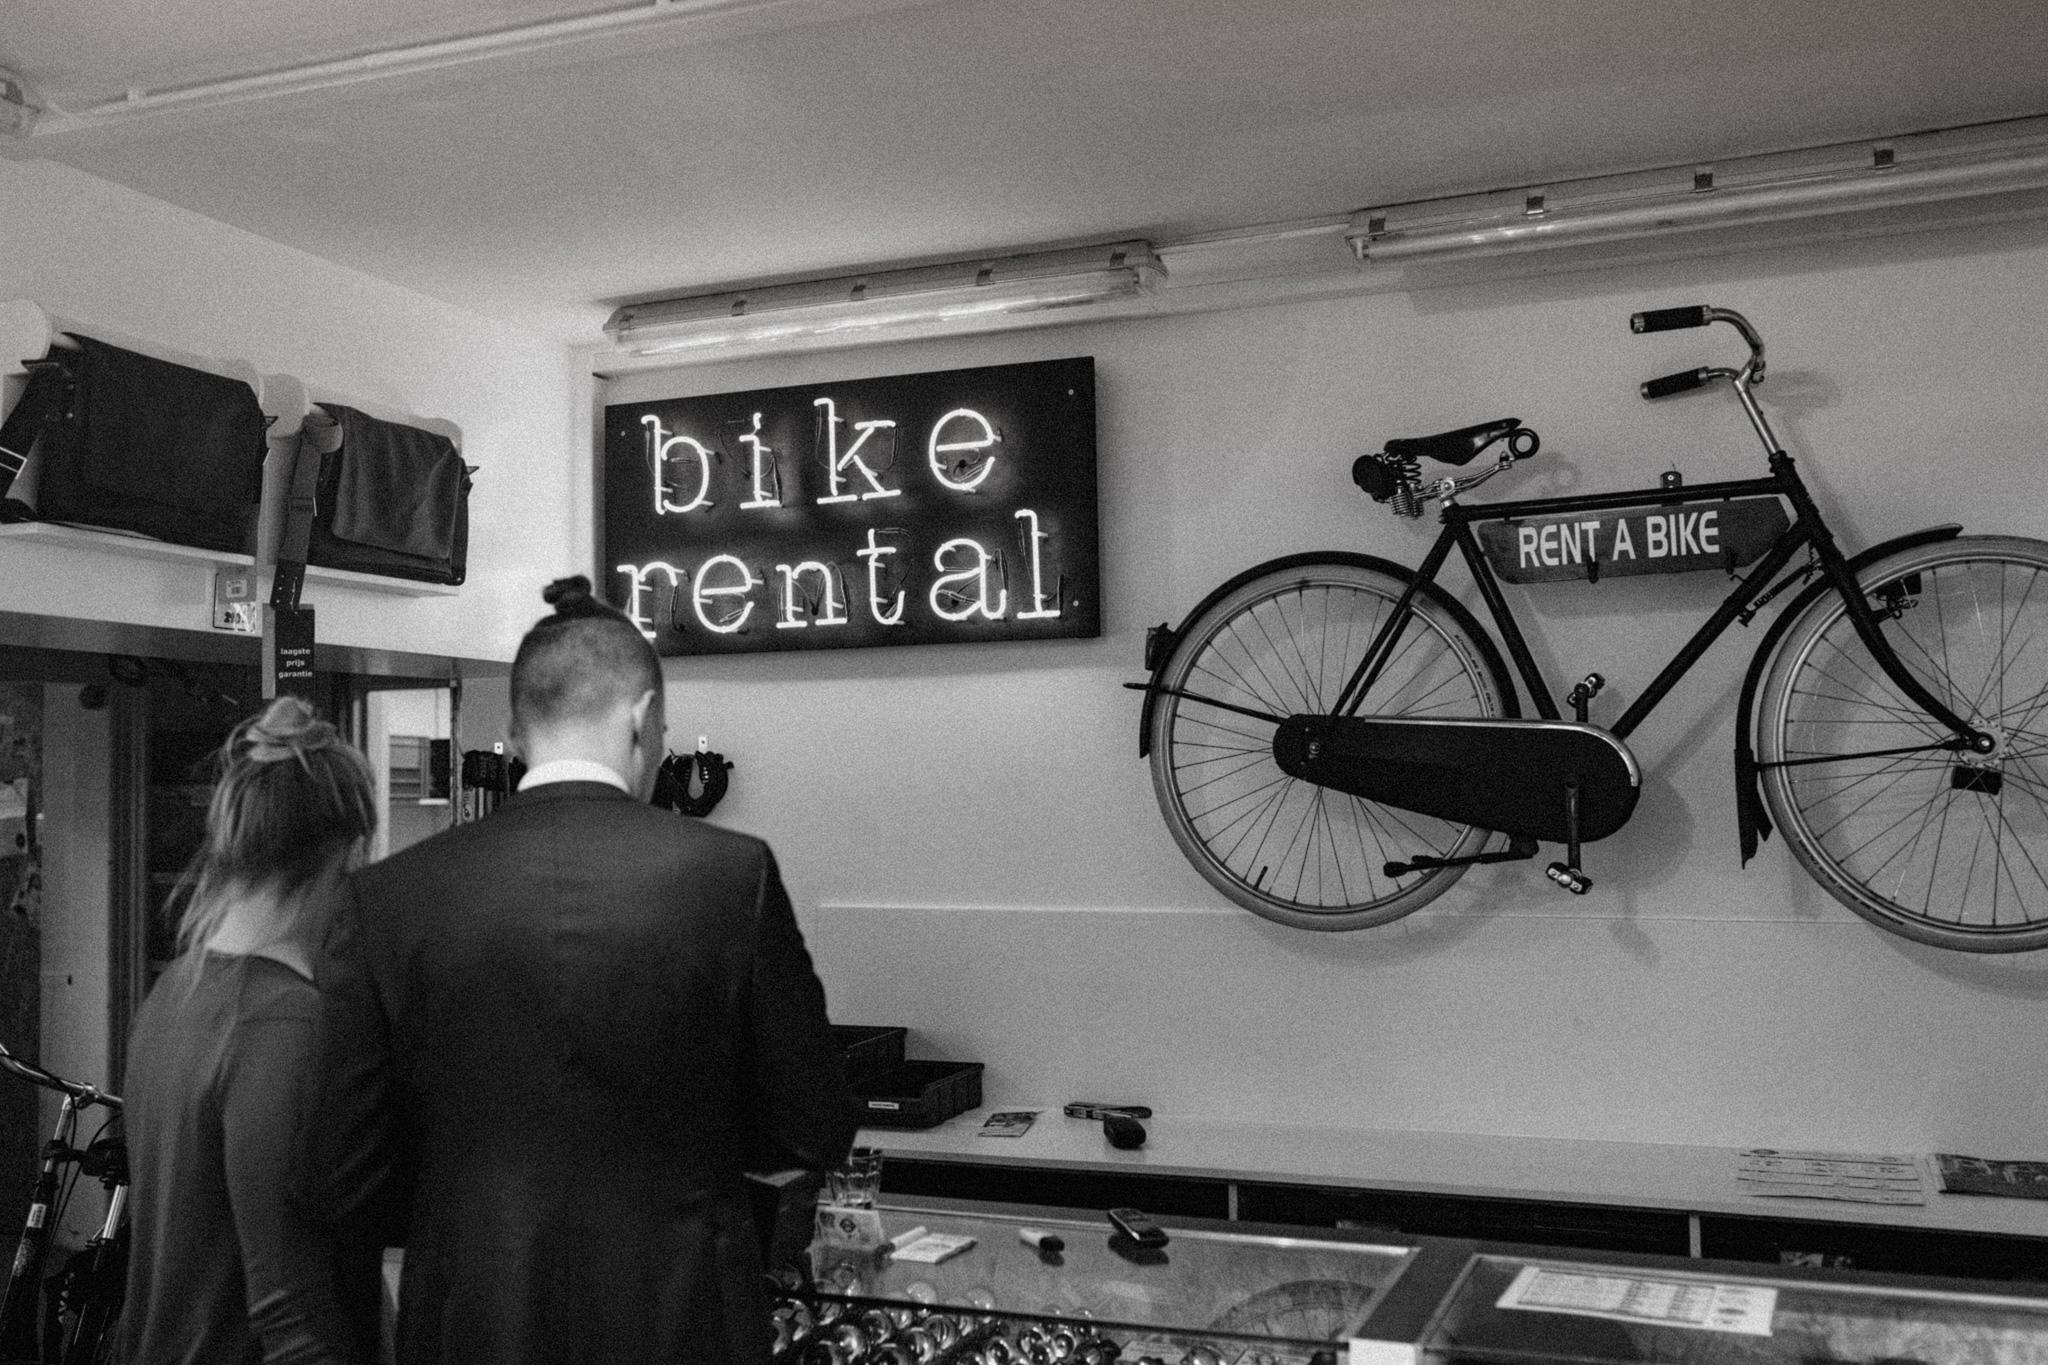 Bike rental sign inside of bike rental shop in Amsterdam